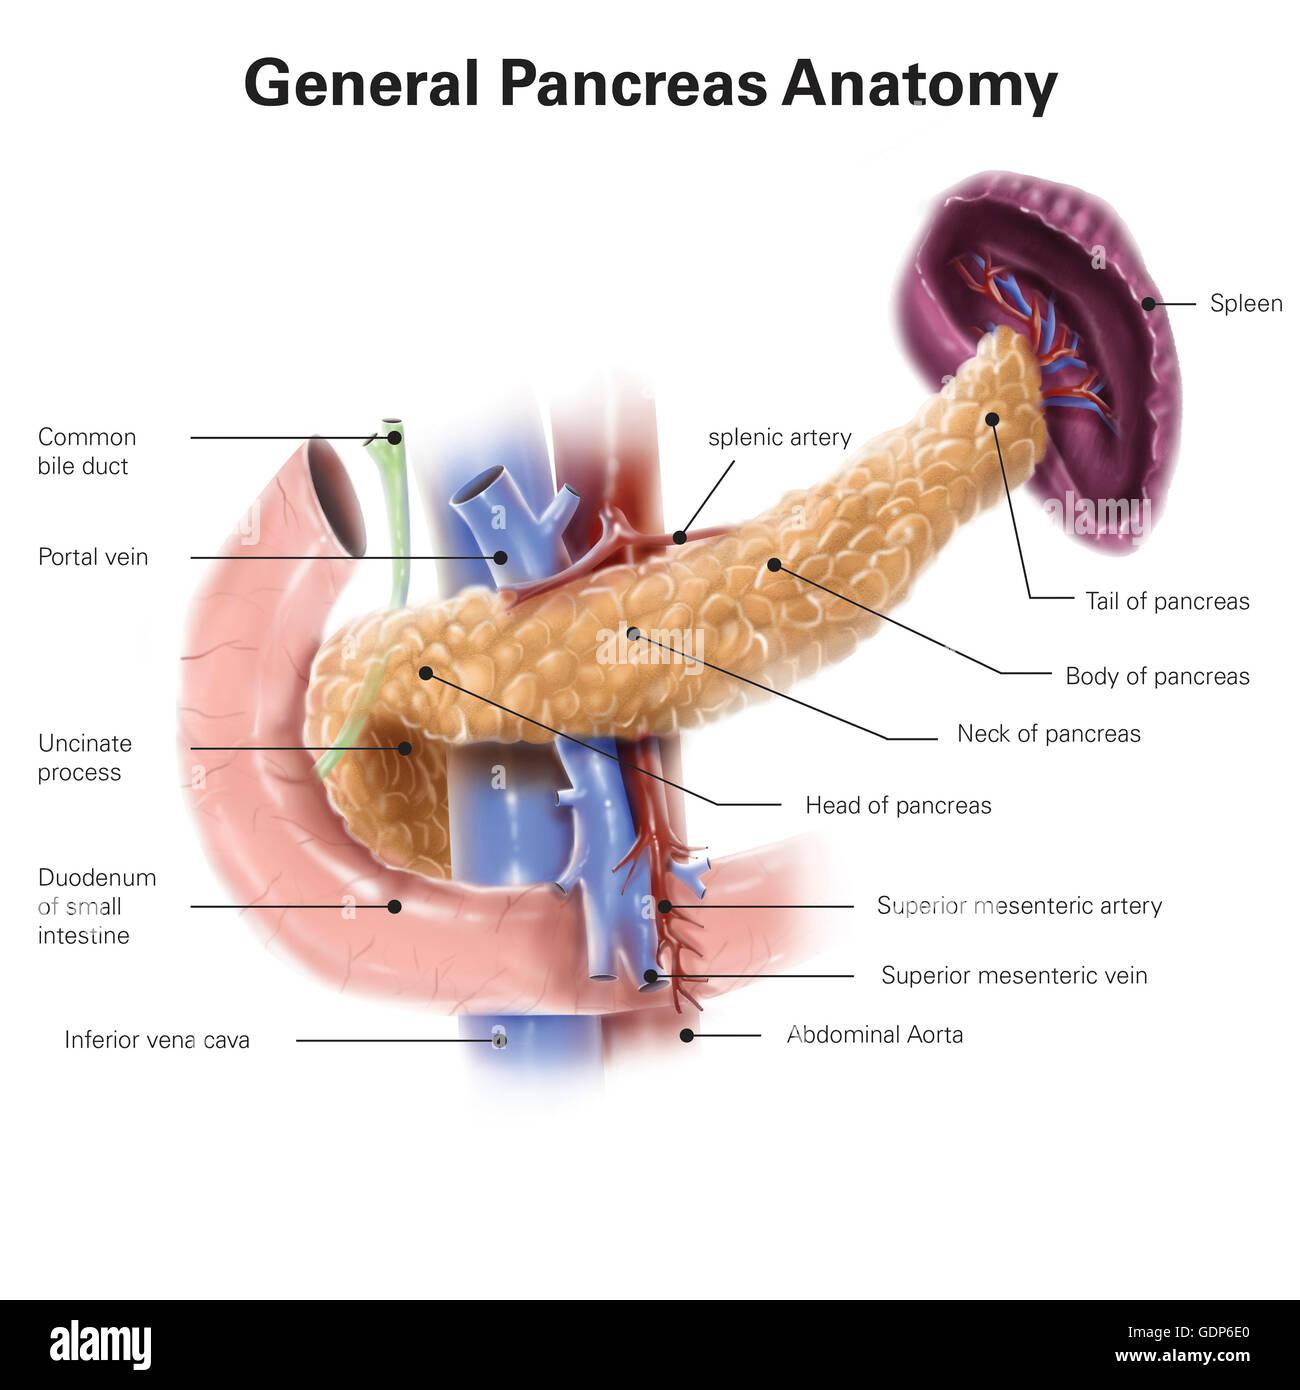 Anatomy Of Human Pancreas With Labels Stock Photo 111740776 Alamy